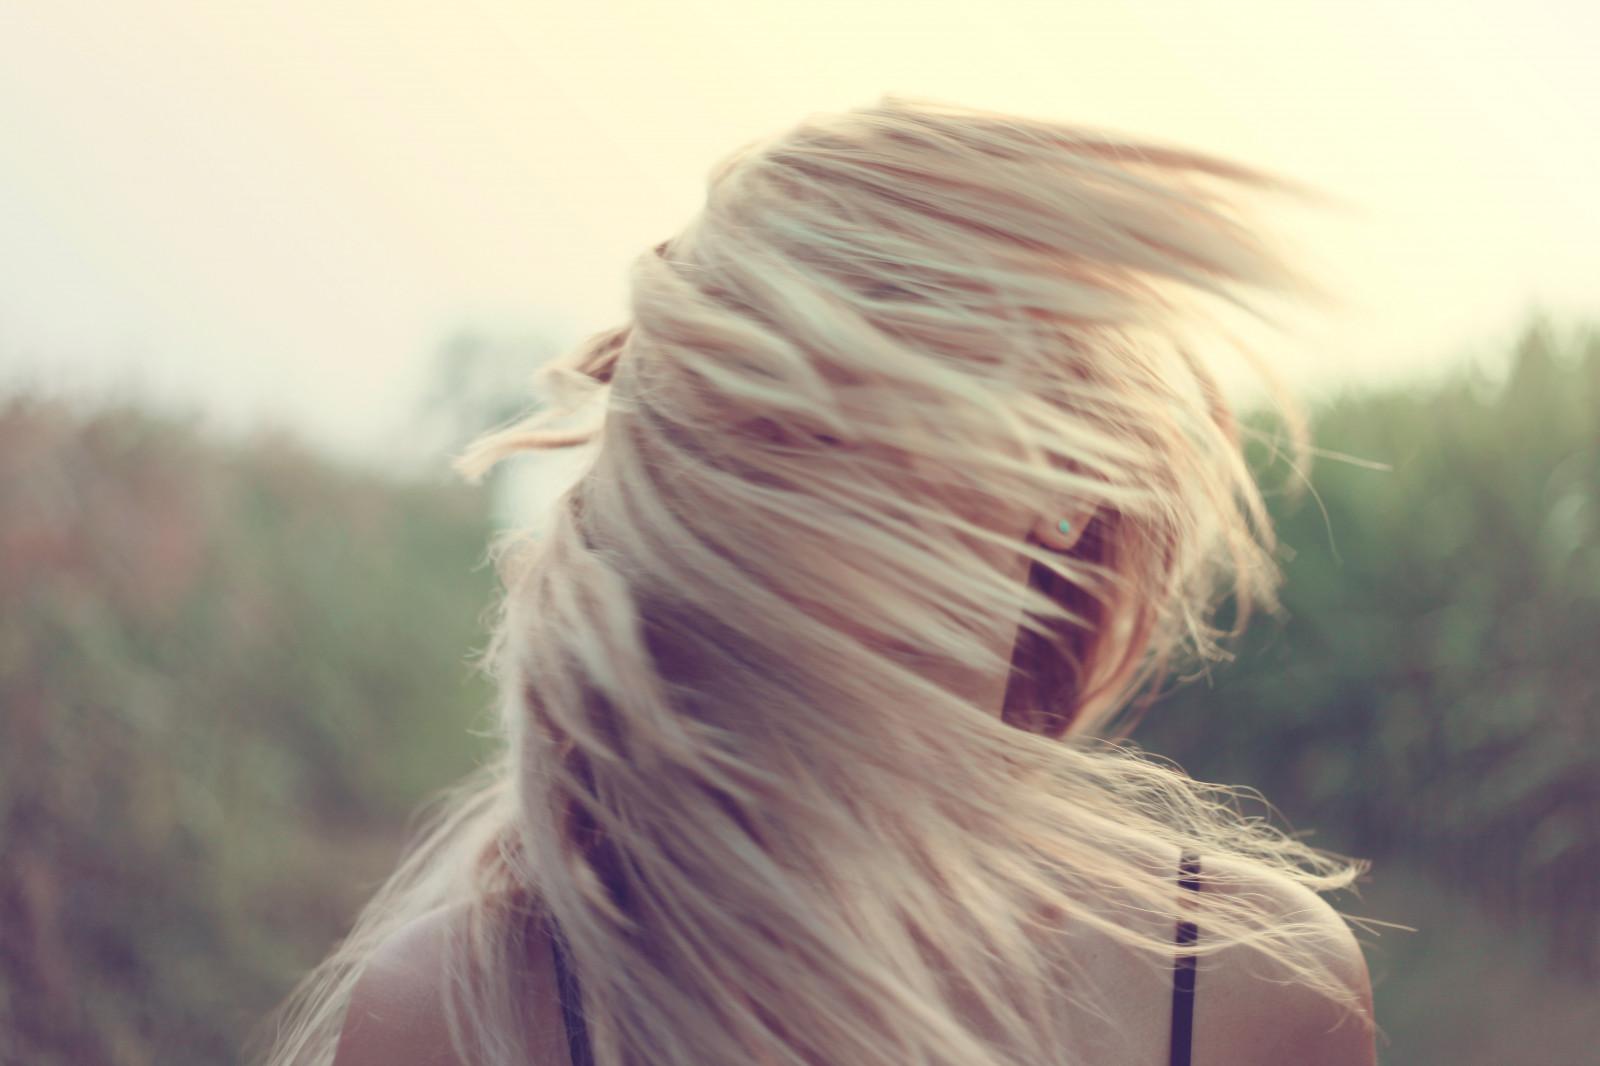 Картинки фото блондинок без лица